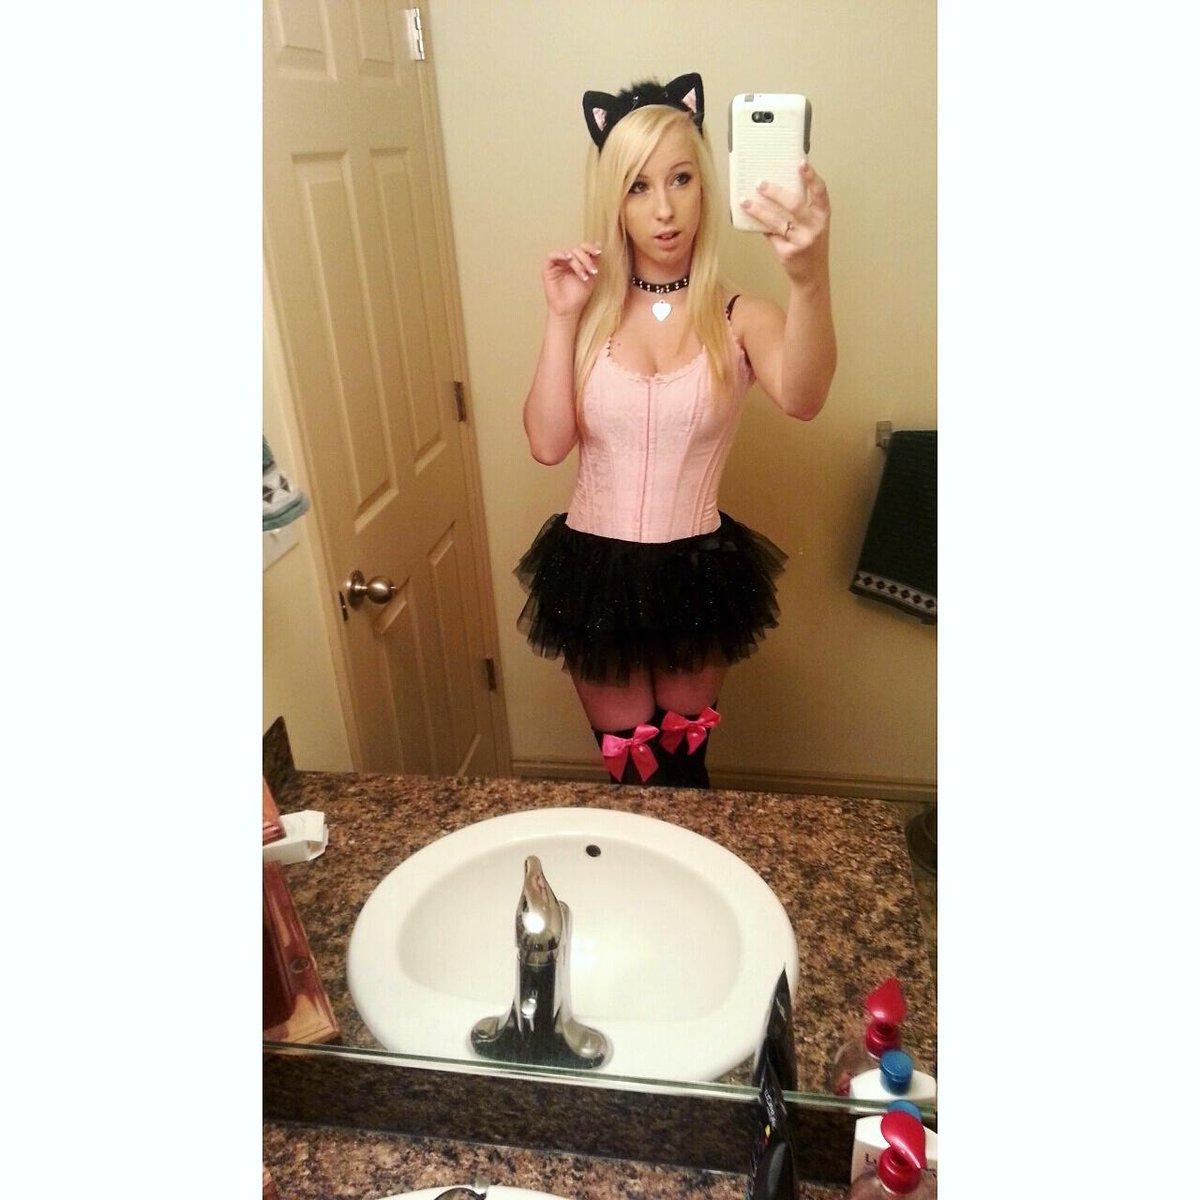 I had such a great halloween 🎃👻💀👿🐱 #halloween2015 #costume #meow #HappyHalloween #trickortreat #petme